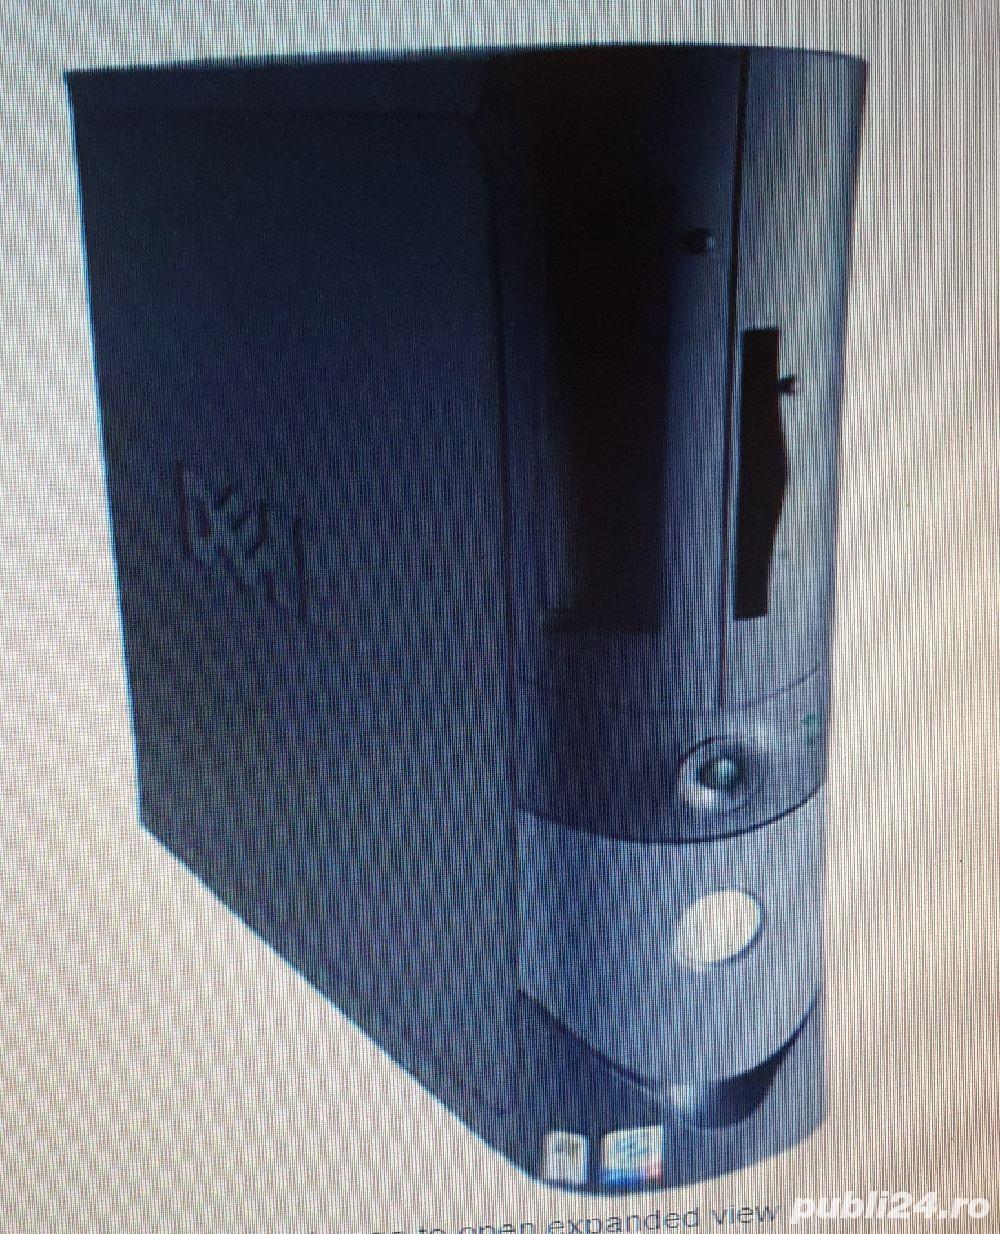 Dell Optiplex 280 3Gb Ram 80Gb Hdd, win 10 pro, calculator stare buna, sistem ok